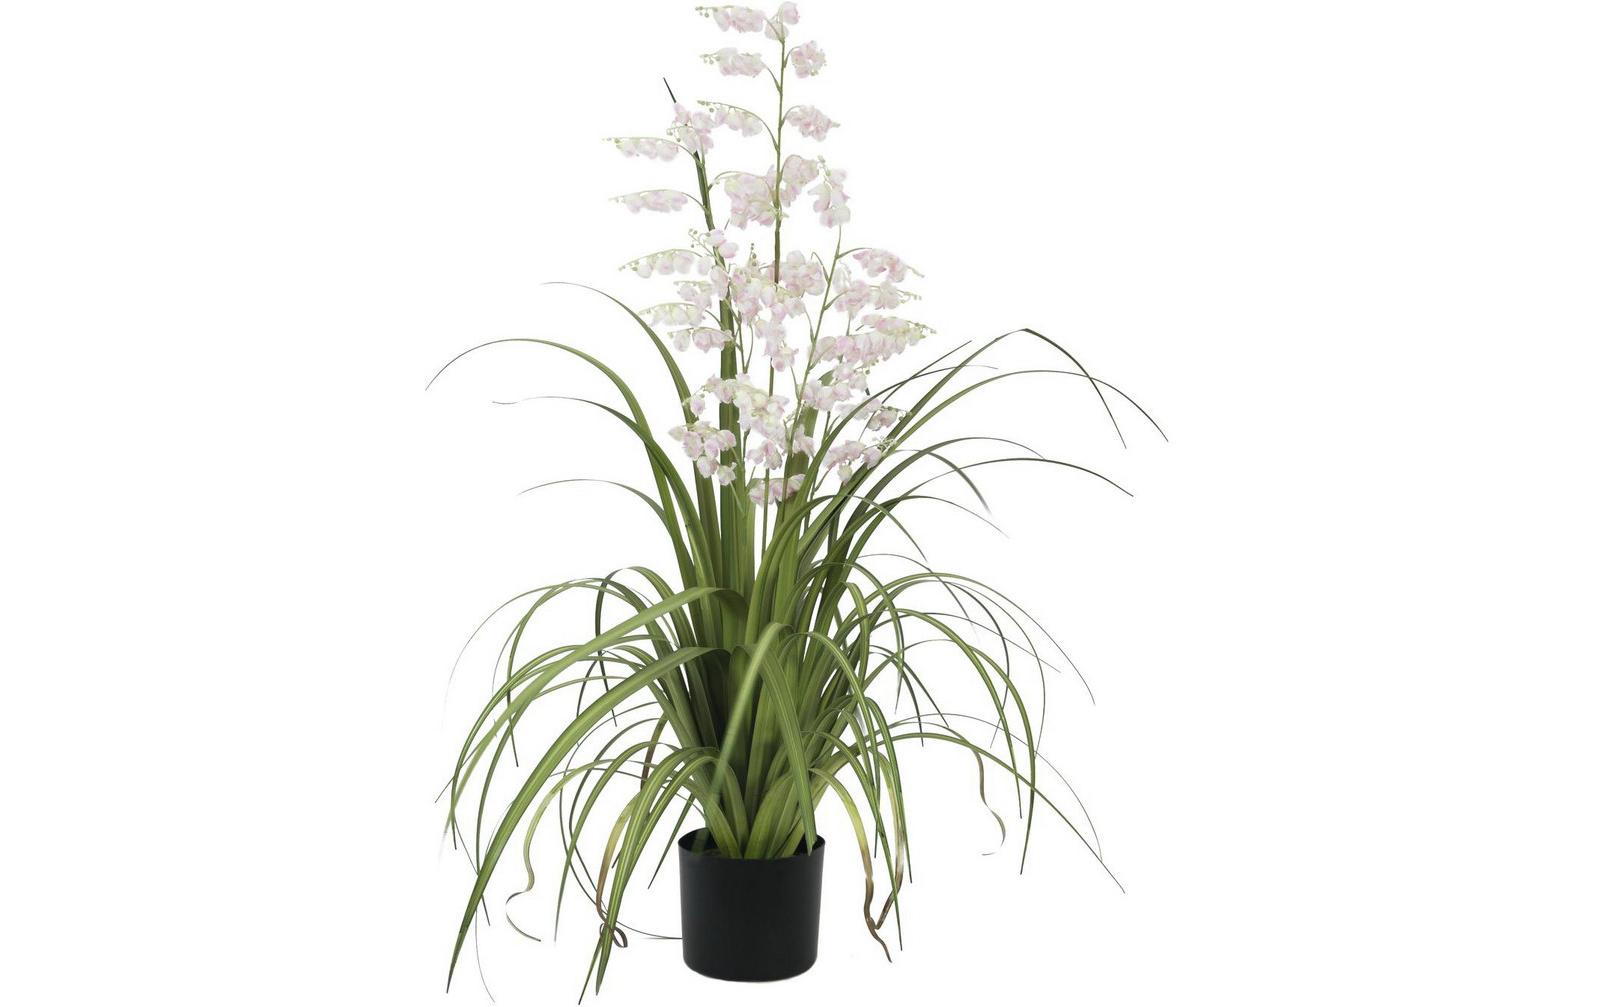 europalms-glockenblume-rose-105cm-kunststoffpflanze